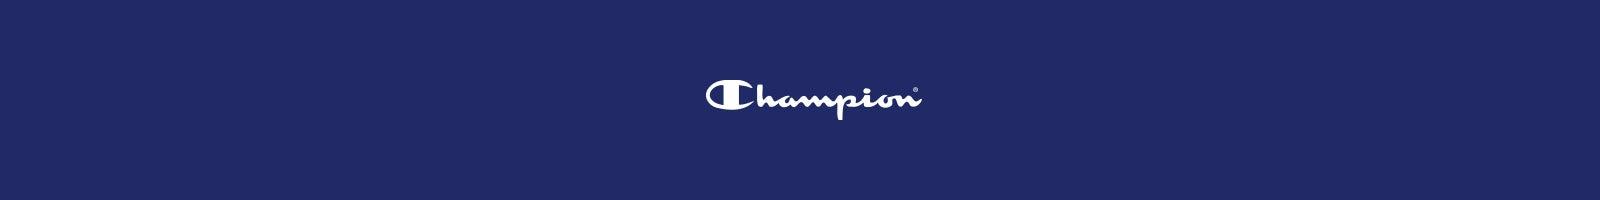 Champion Shoes \u0026 Clothing | Foot Locker